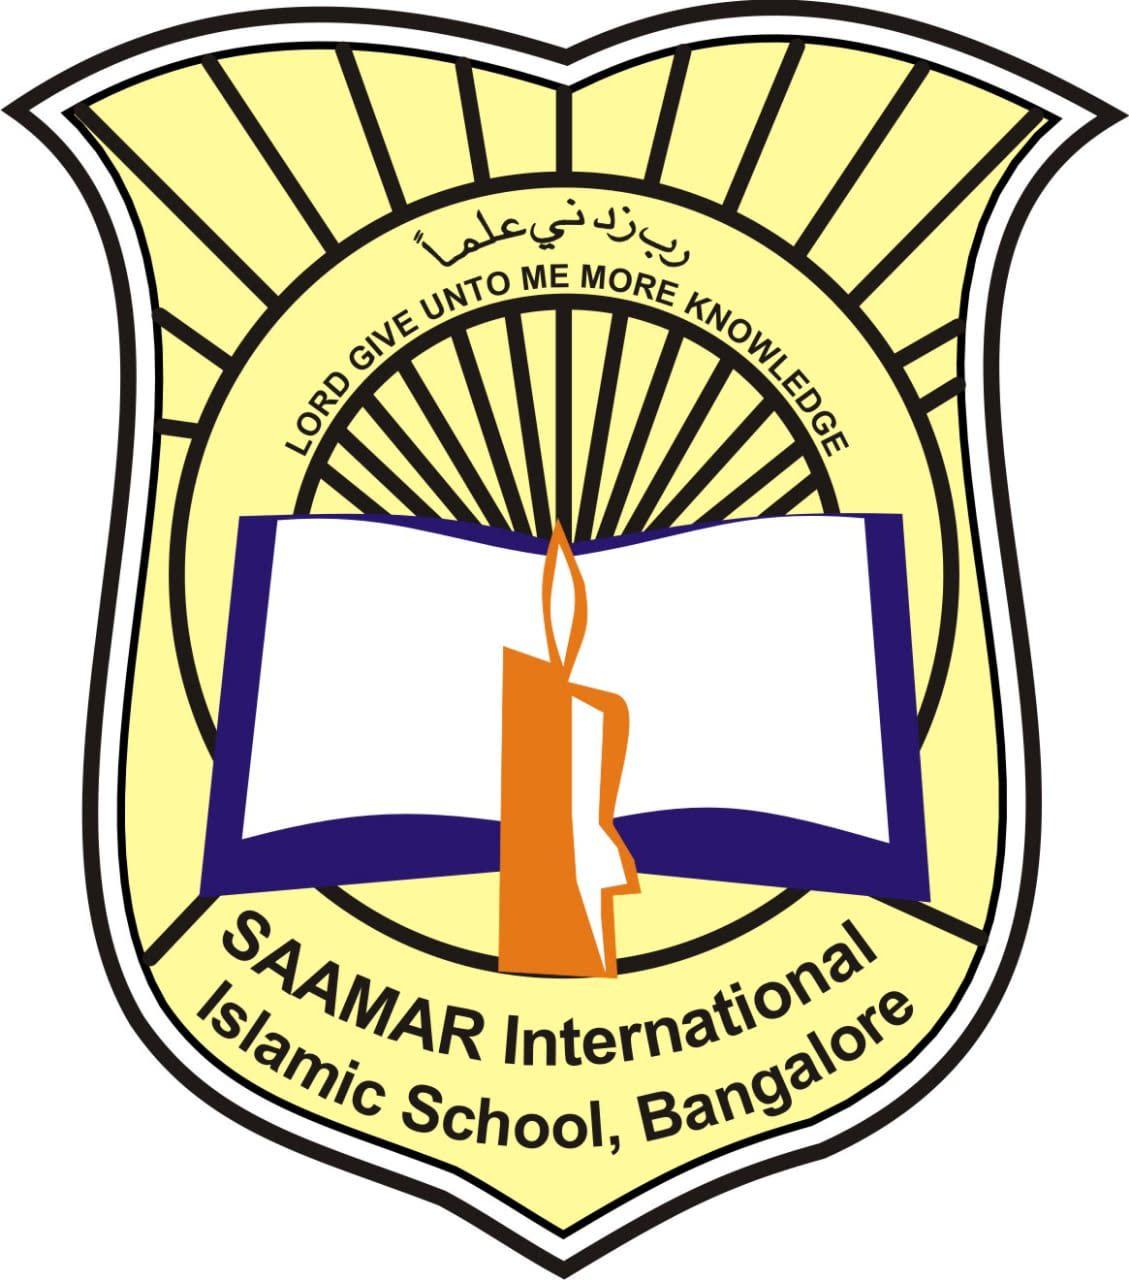 Samaar International School